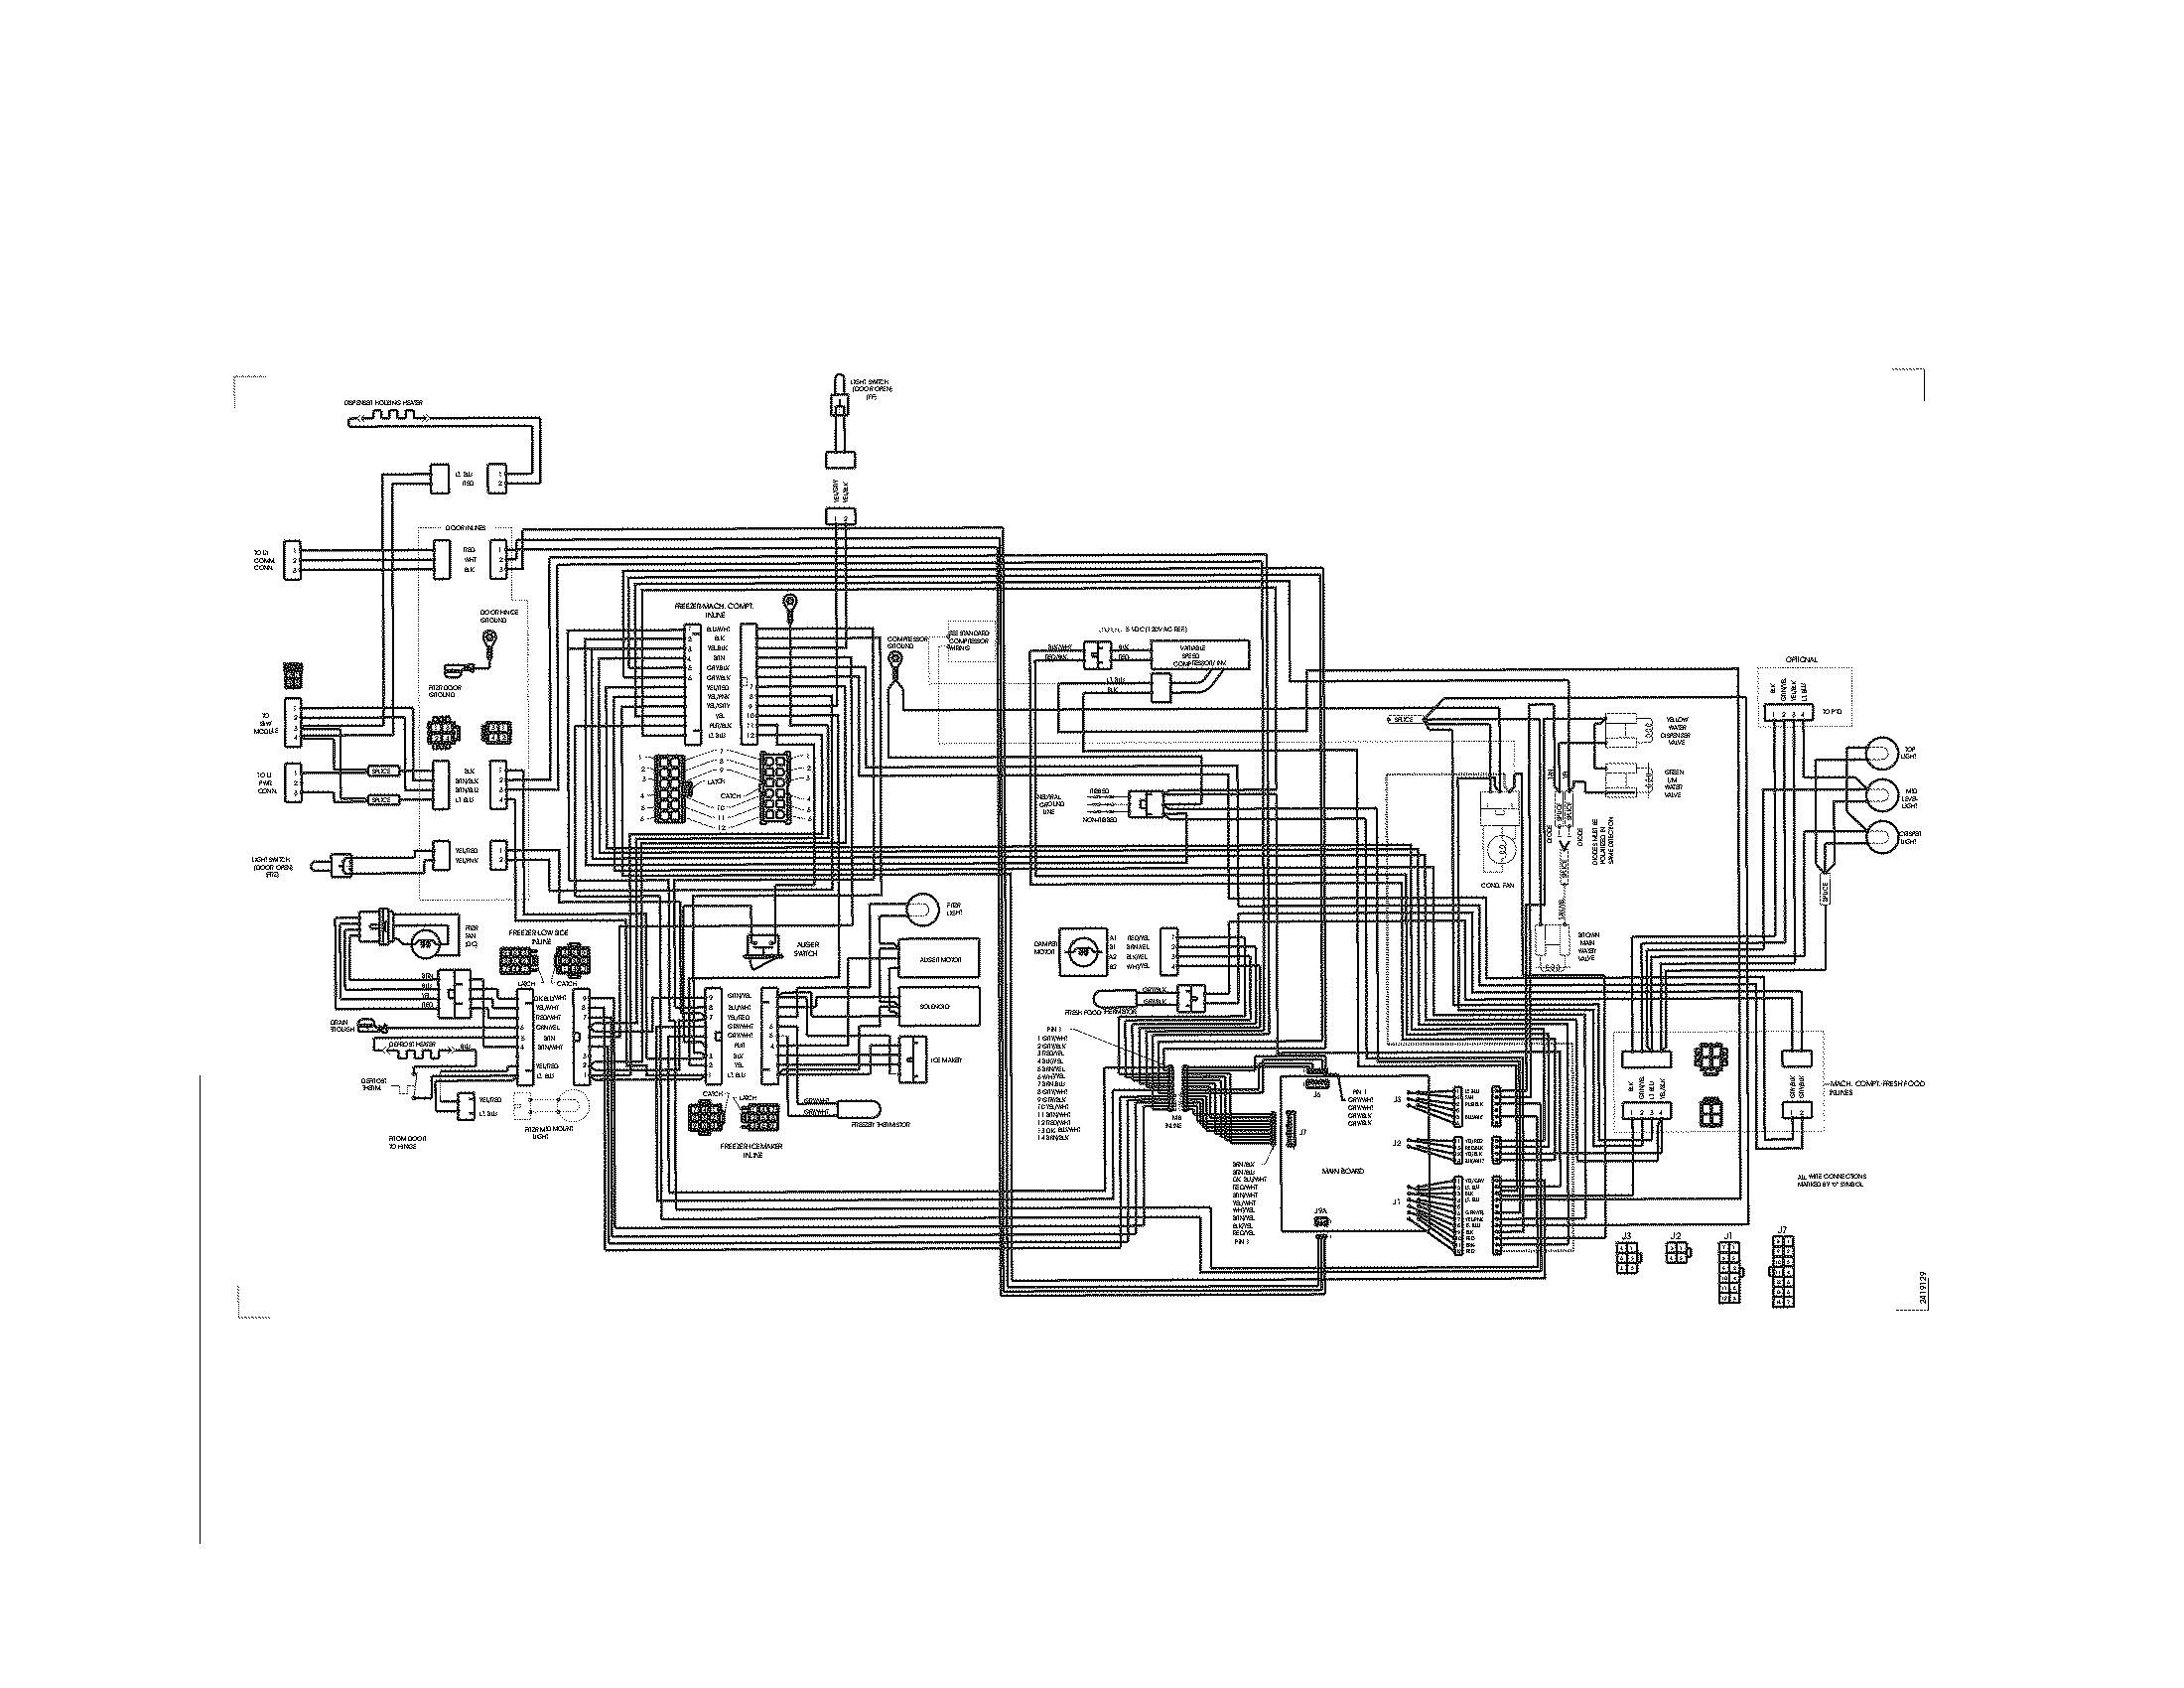 Electrolux  Refrigerator  Wiring diagram